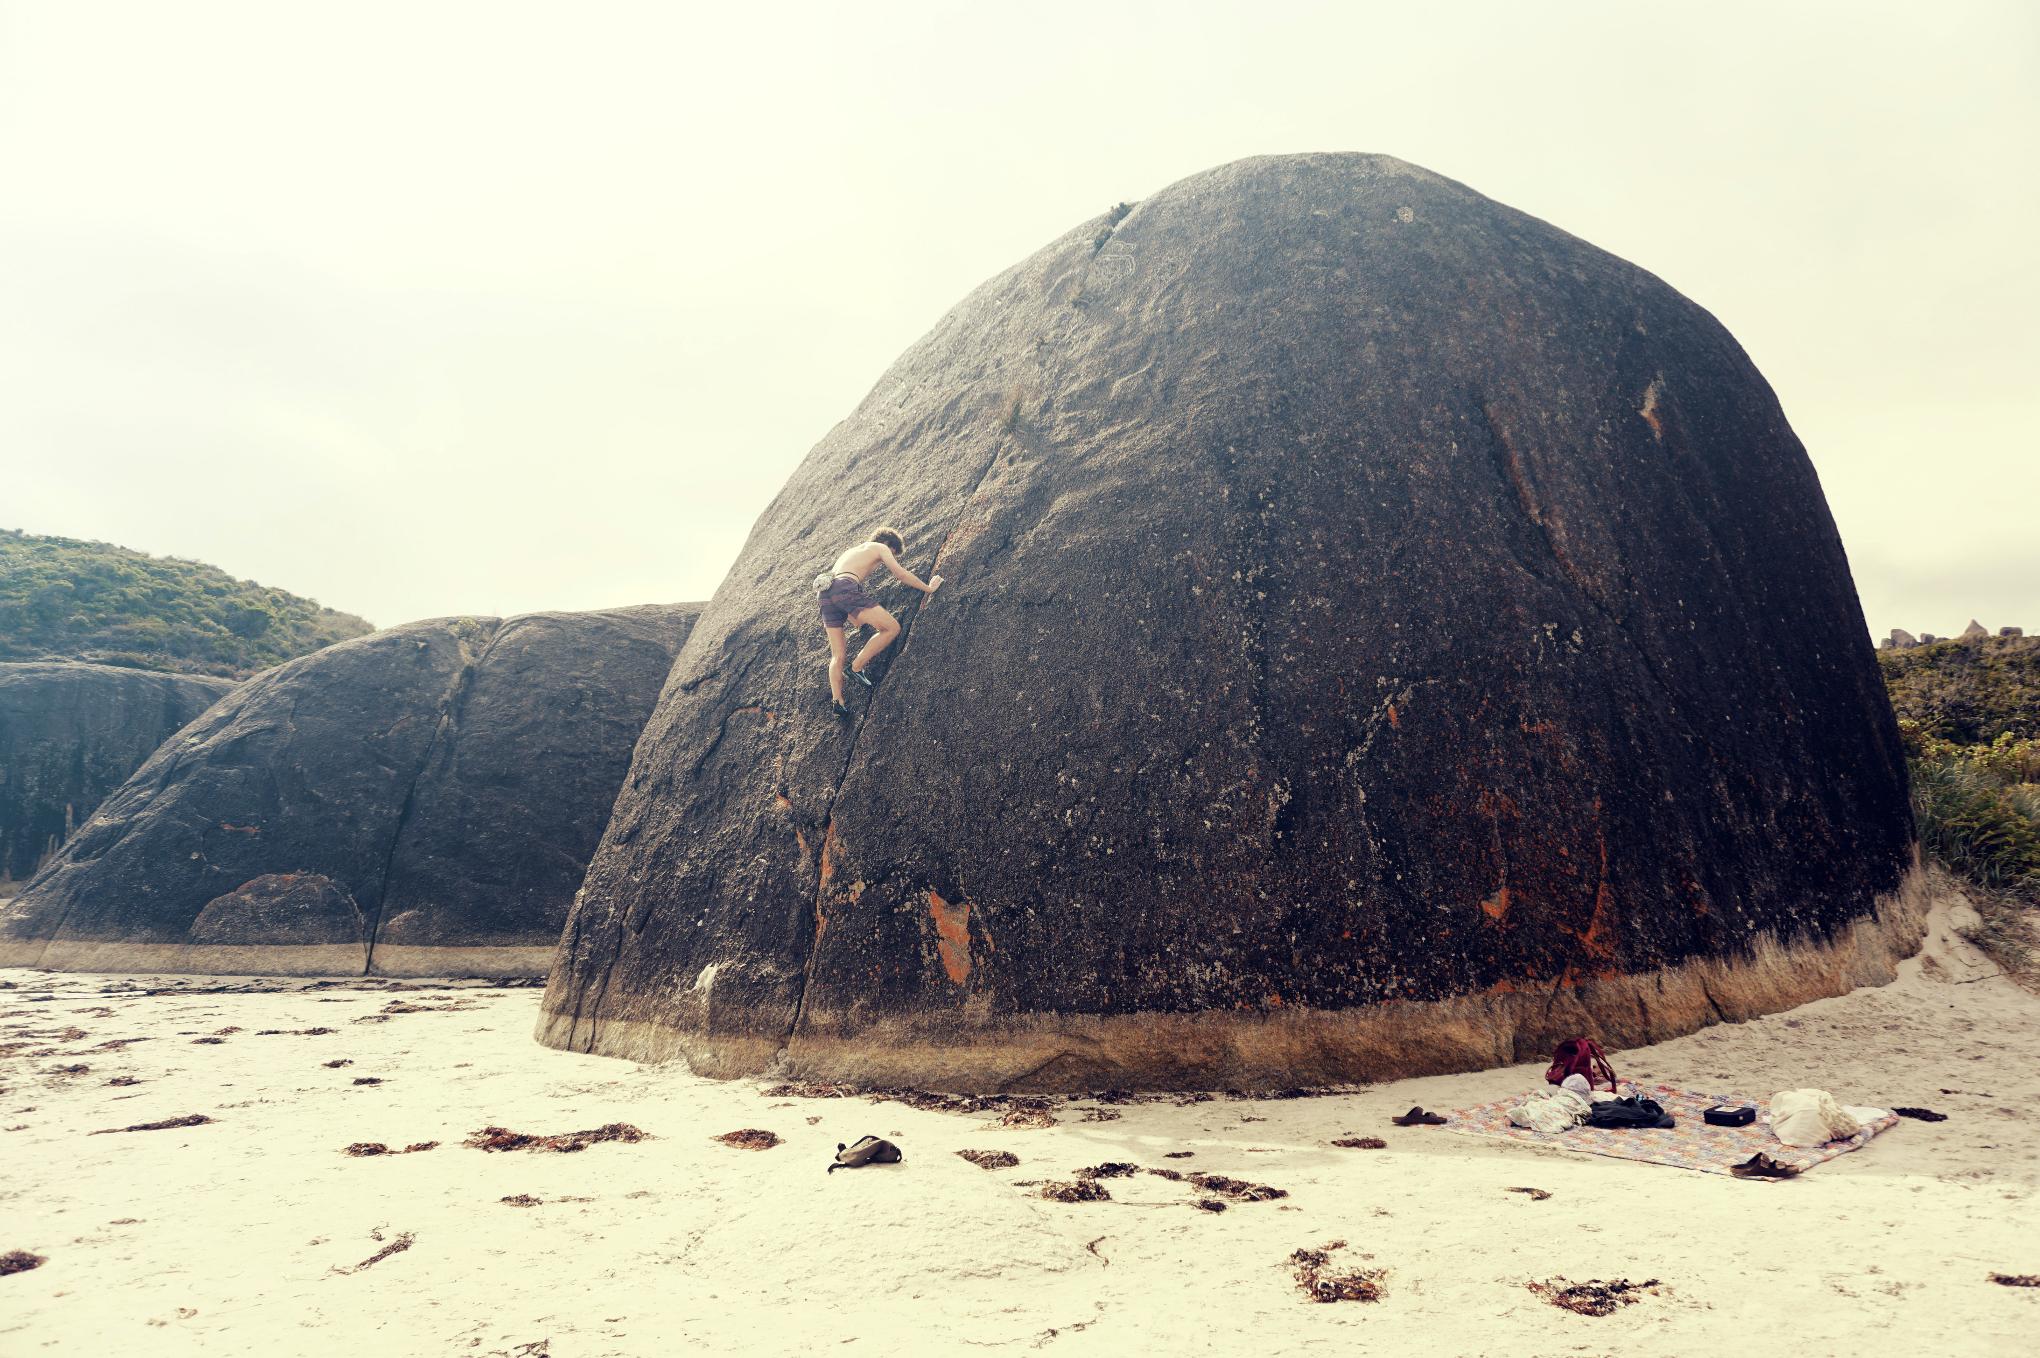 maybeyoulike_elephant_rocks_australia_8